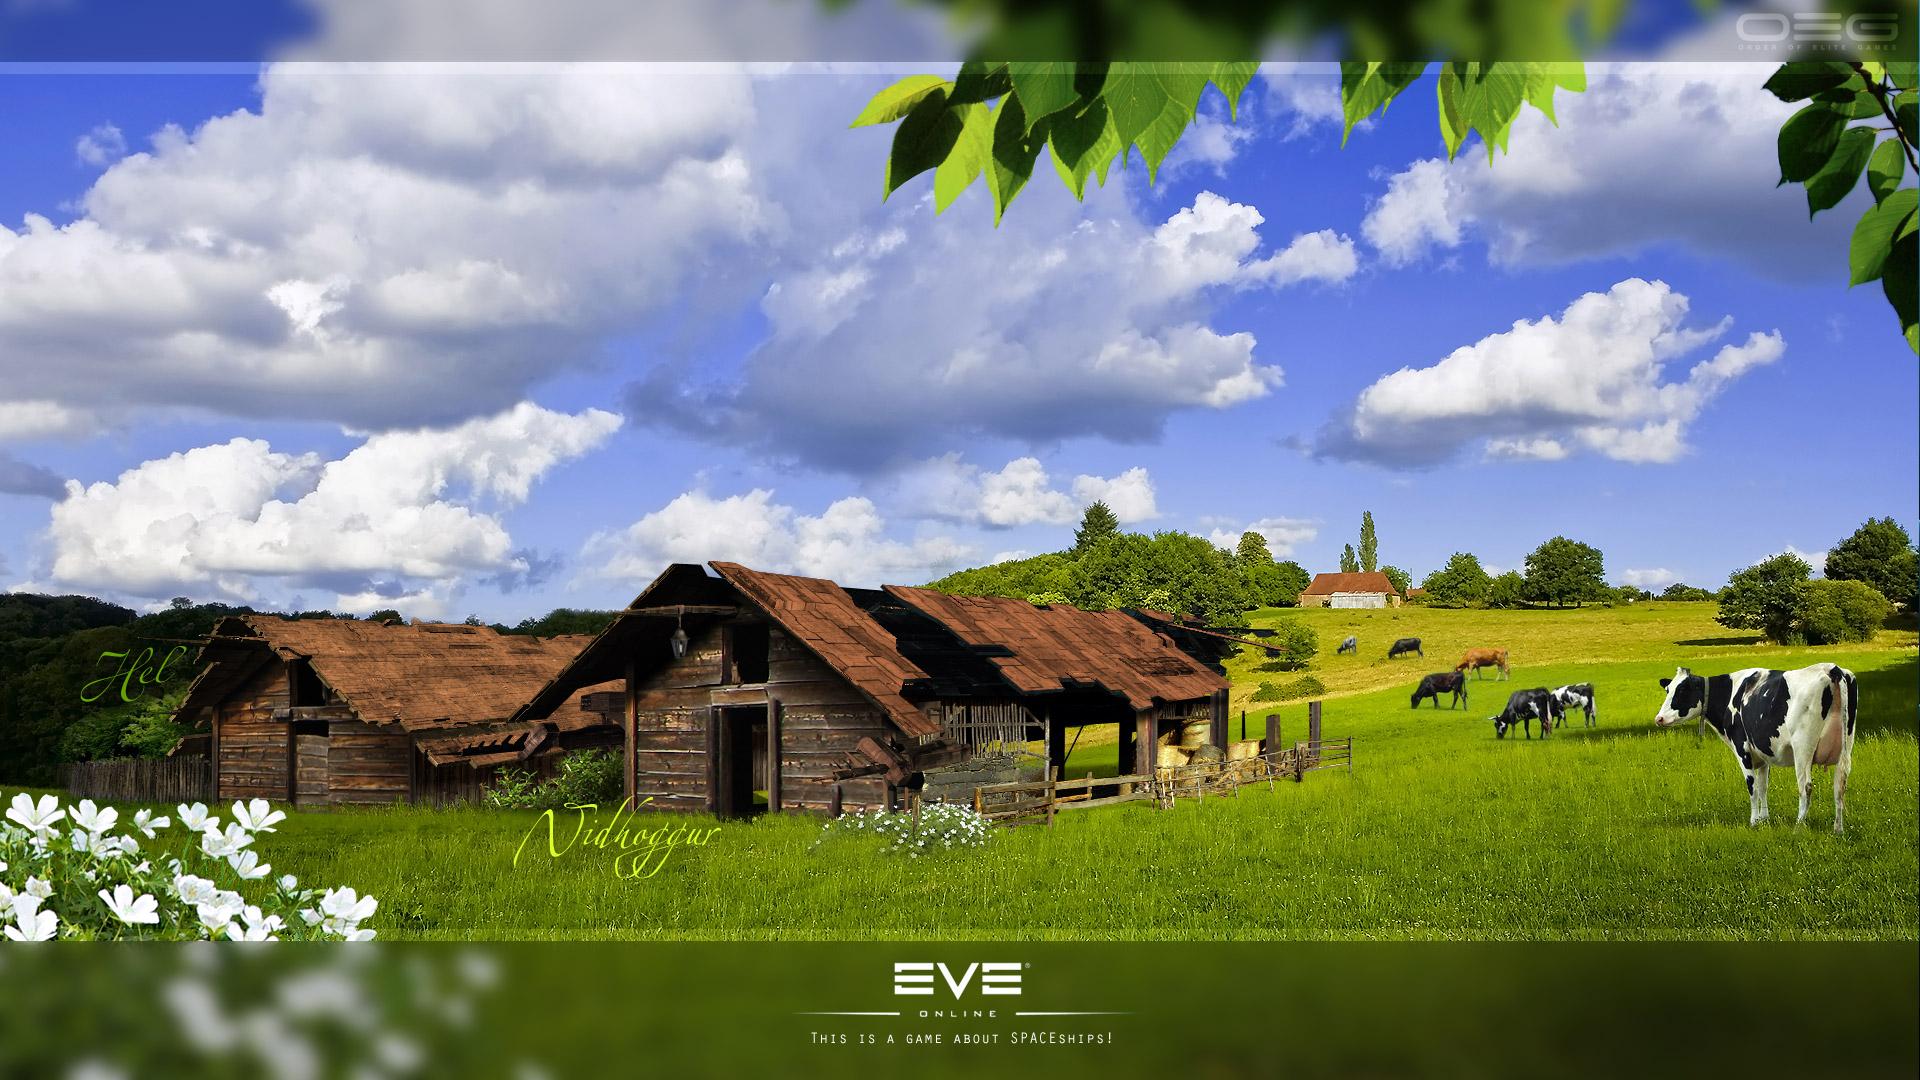 Village Beautiful life hd wallpaper Unique HD Wallpapers 1920x1080